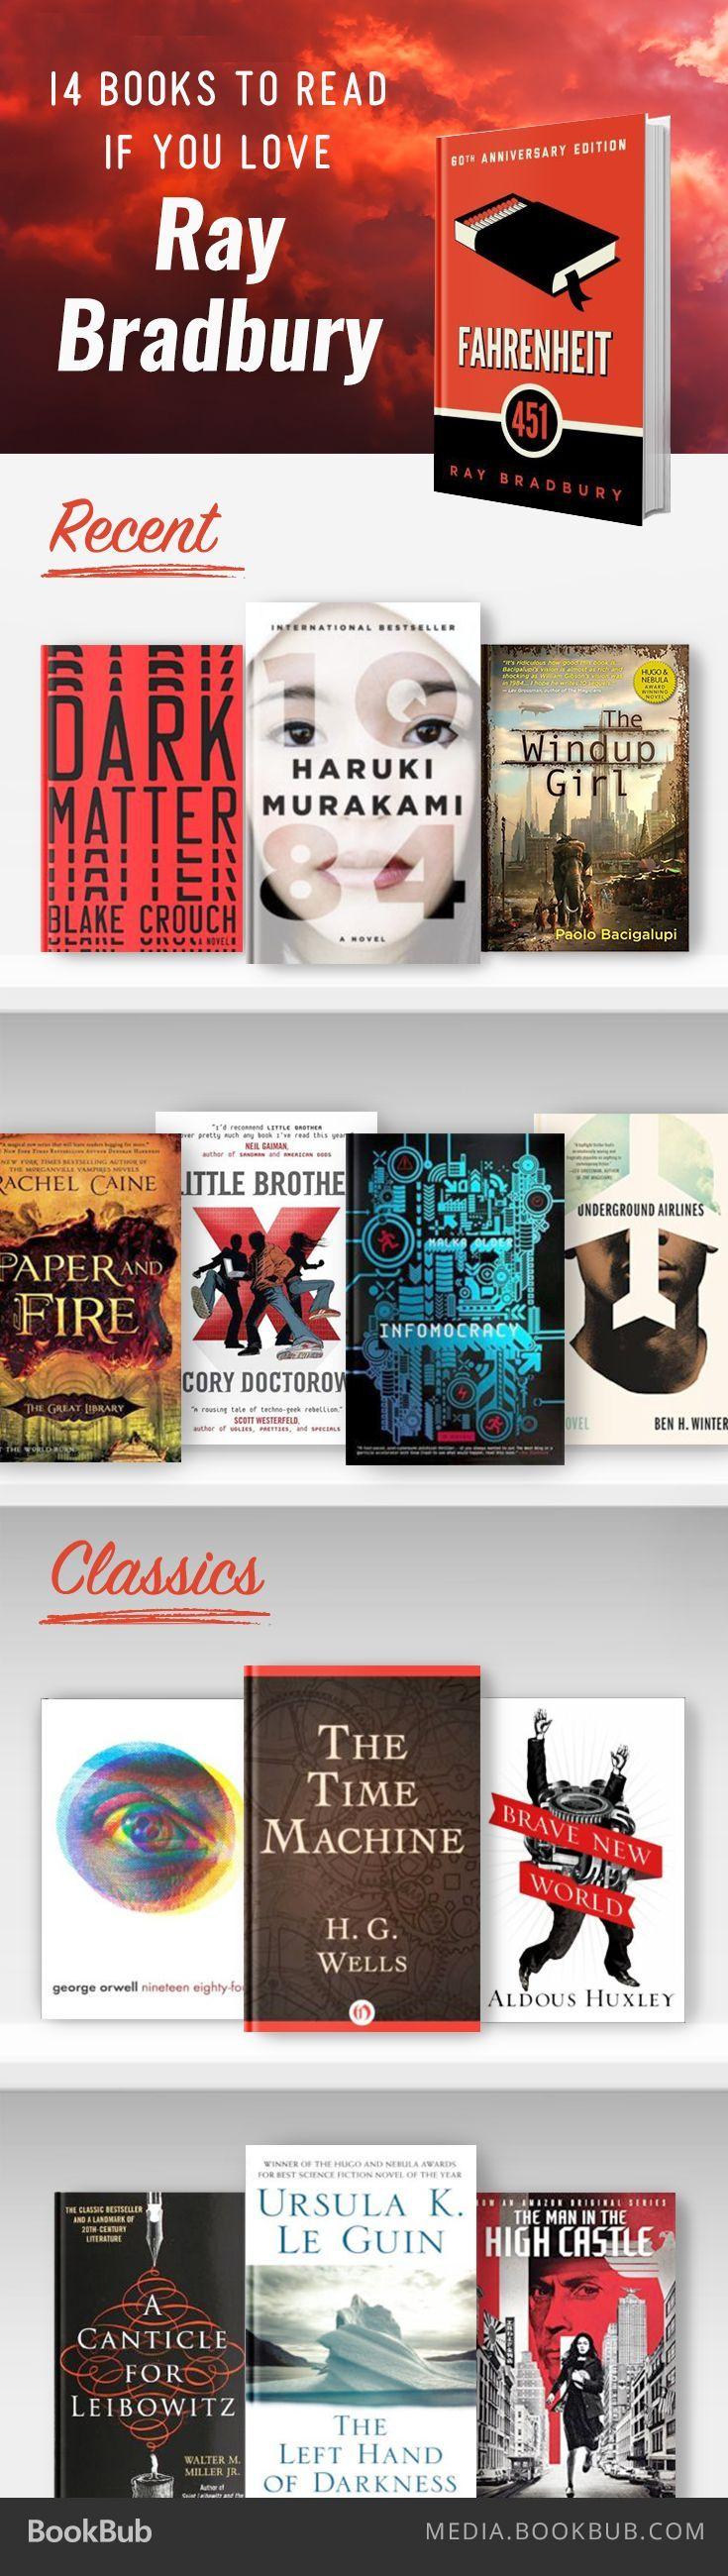 14 Books To Read If You Love Ray Bradbury